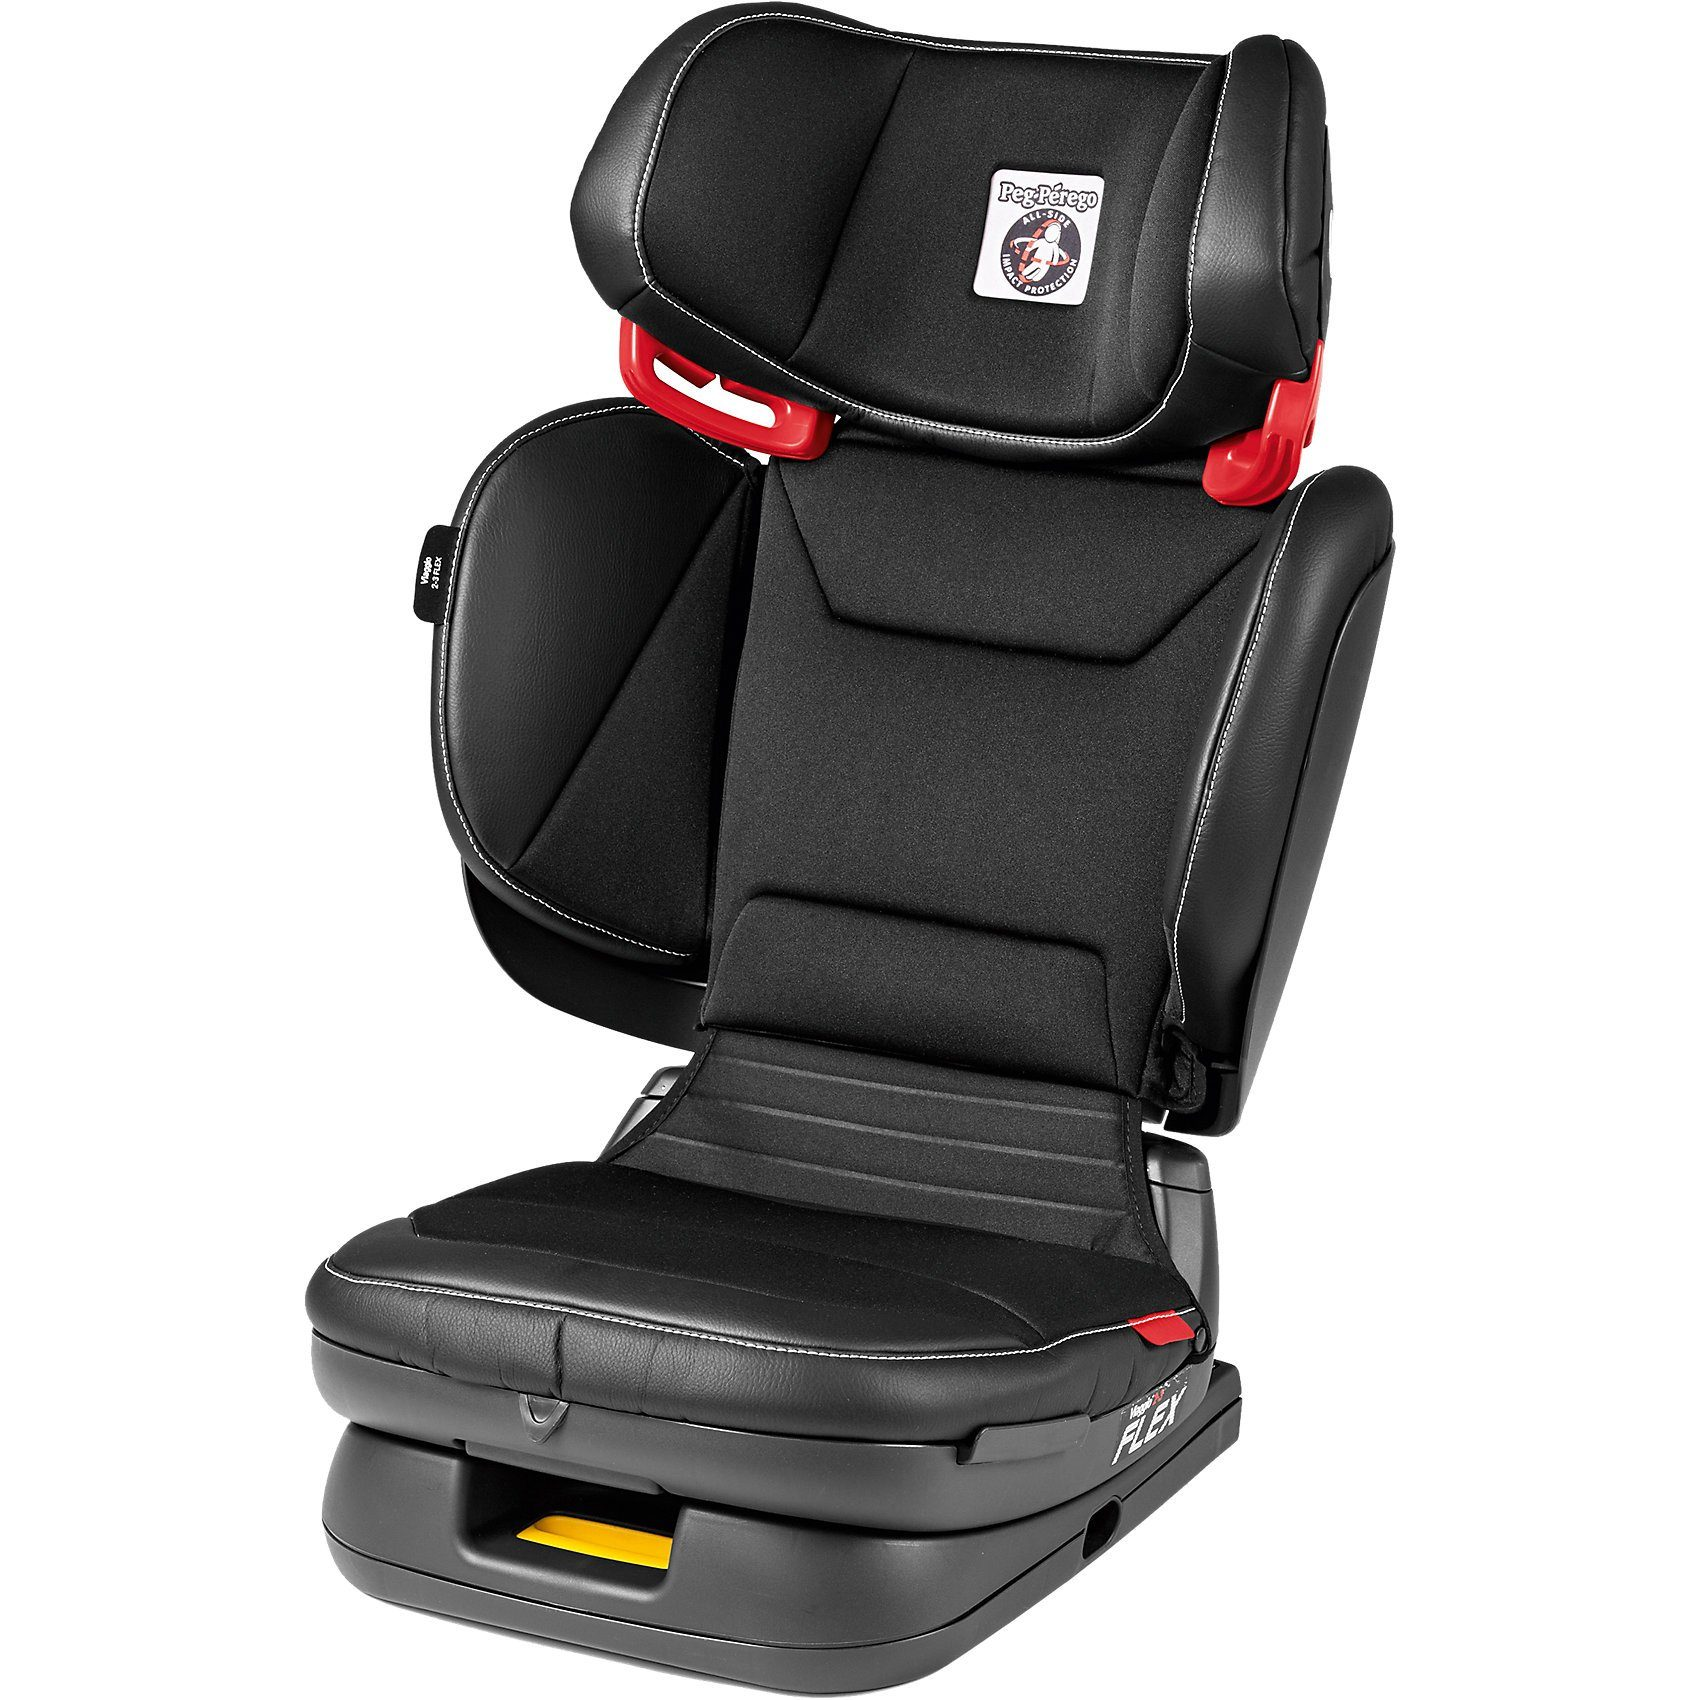 Peg Perego Auto-Kindersitz Viaggio 2-3 Flex, Licorice, 2018